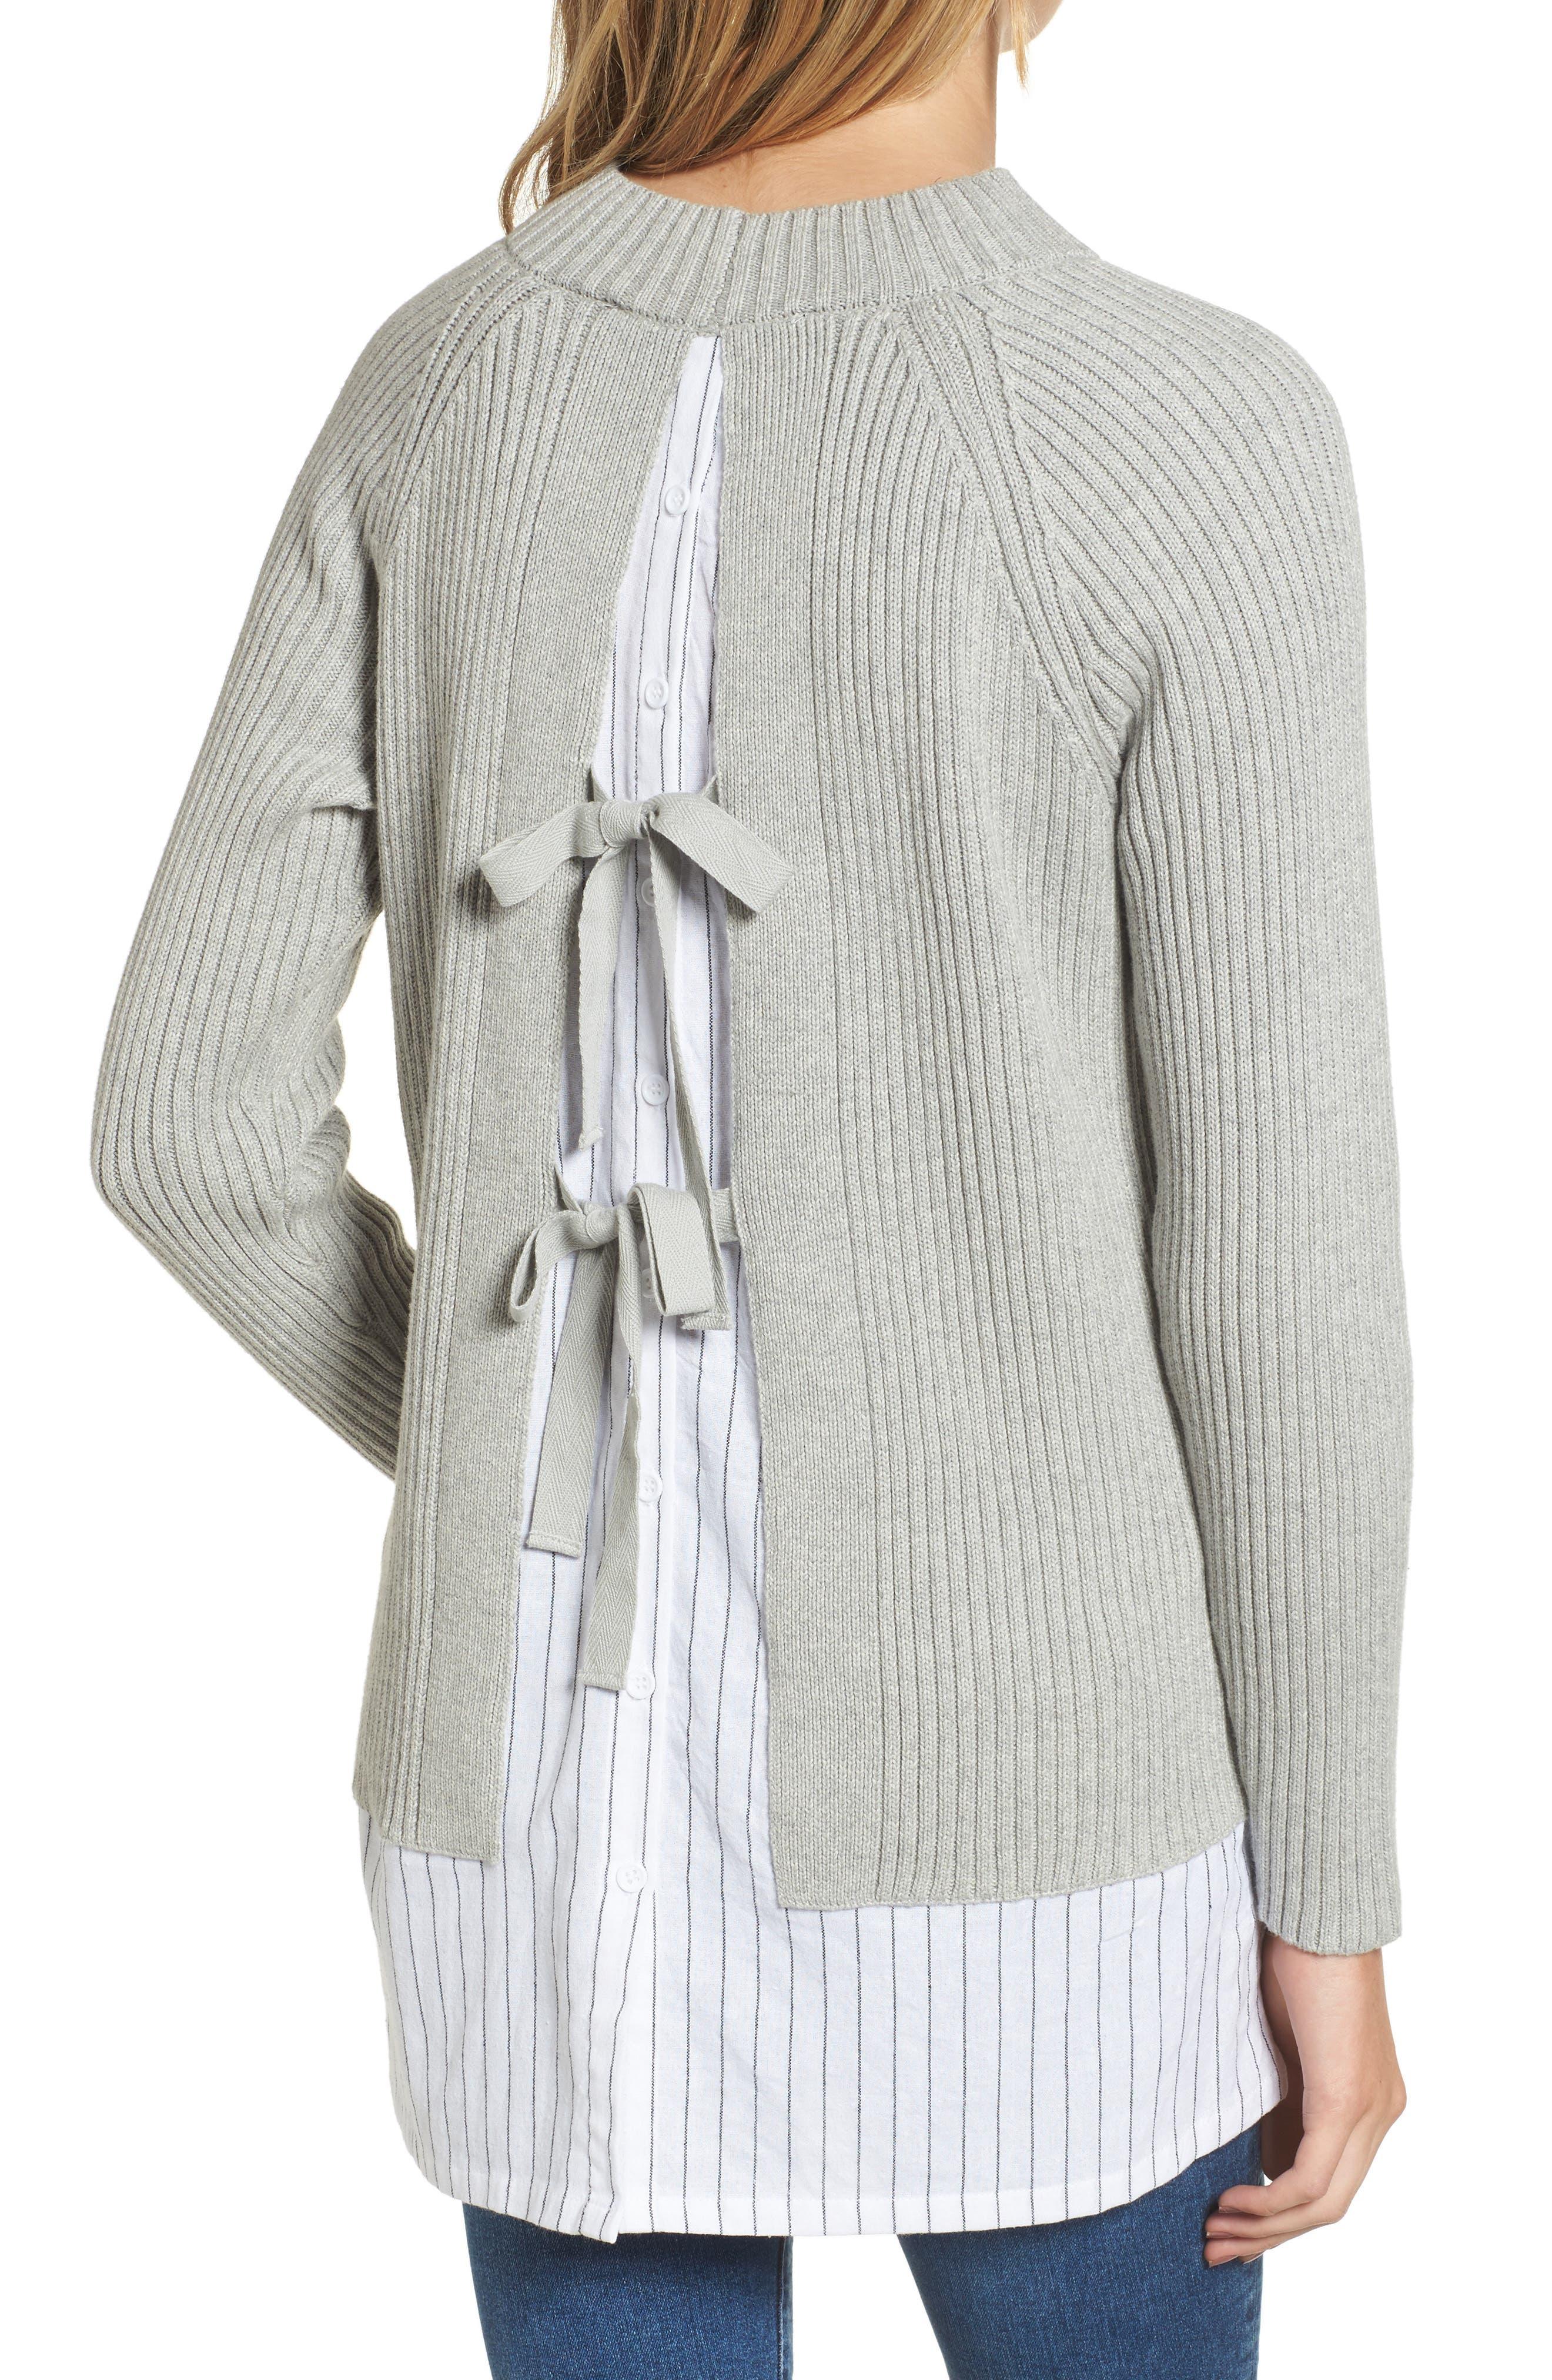 Ila Sweater,                             Alternate thumbnail 2, color,                             304